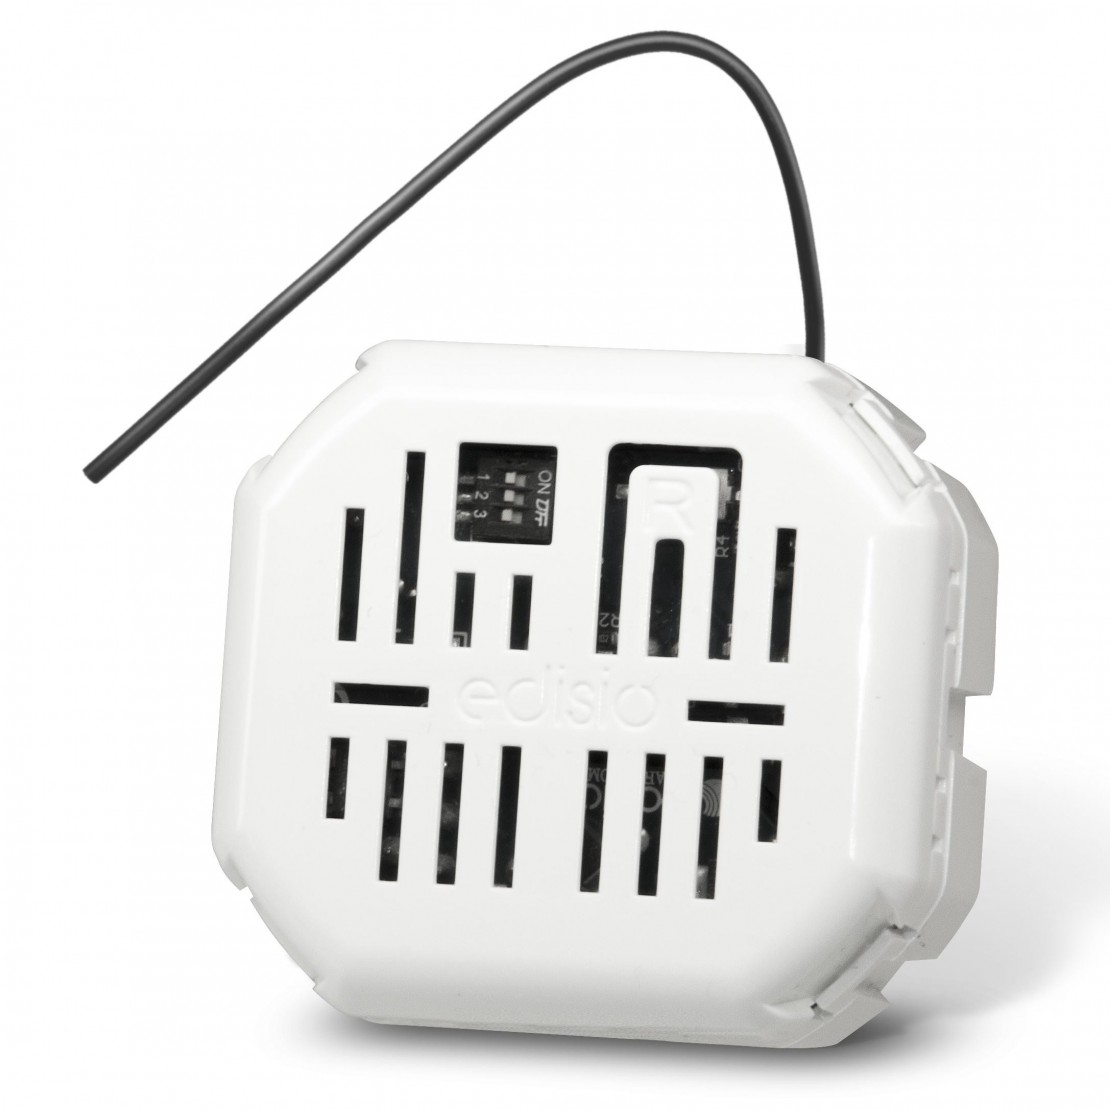 Micromódulo regulador emisor/receptor